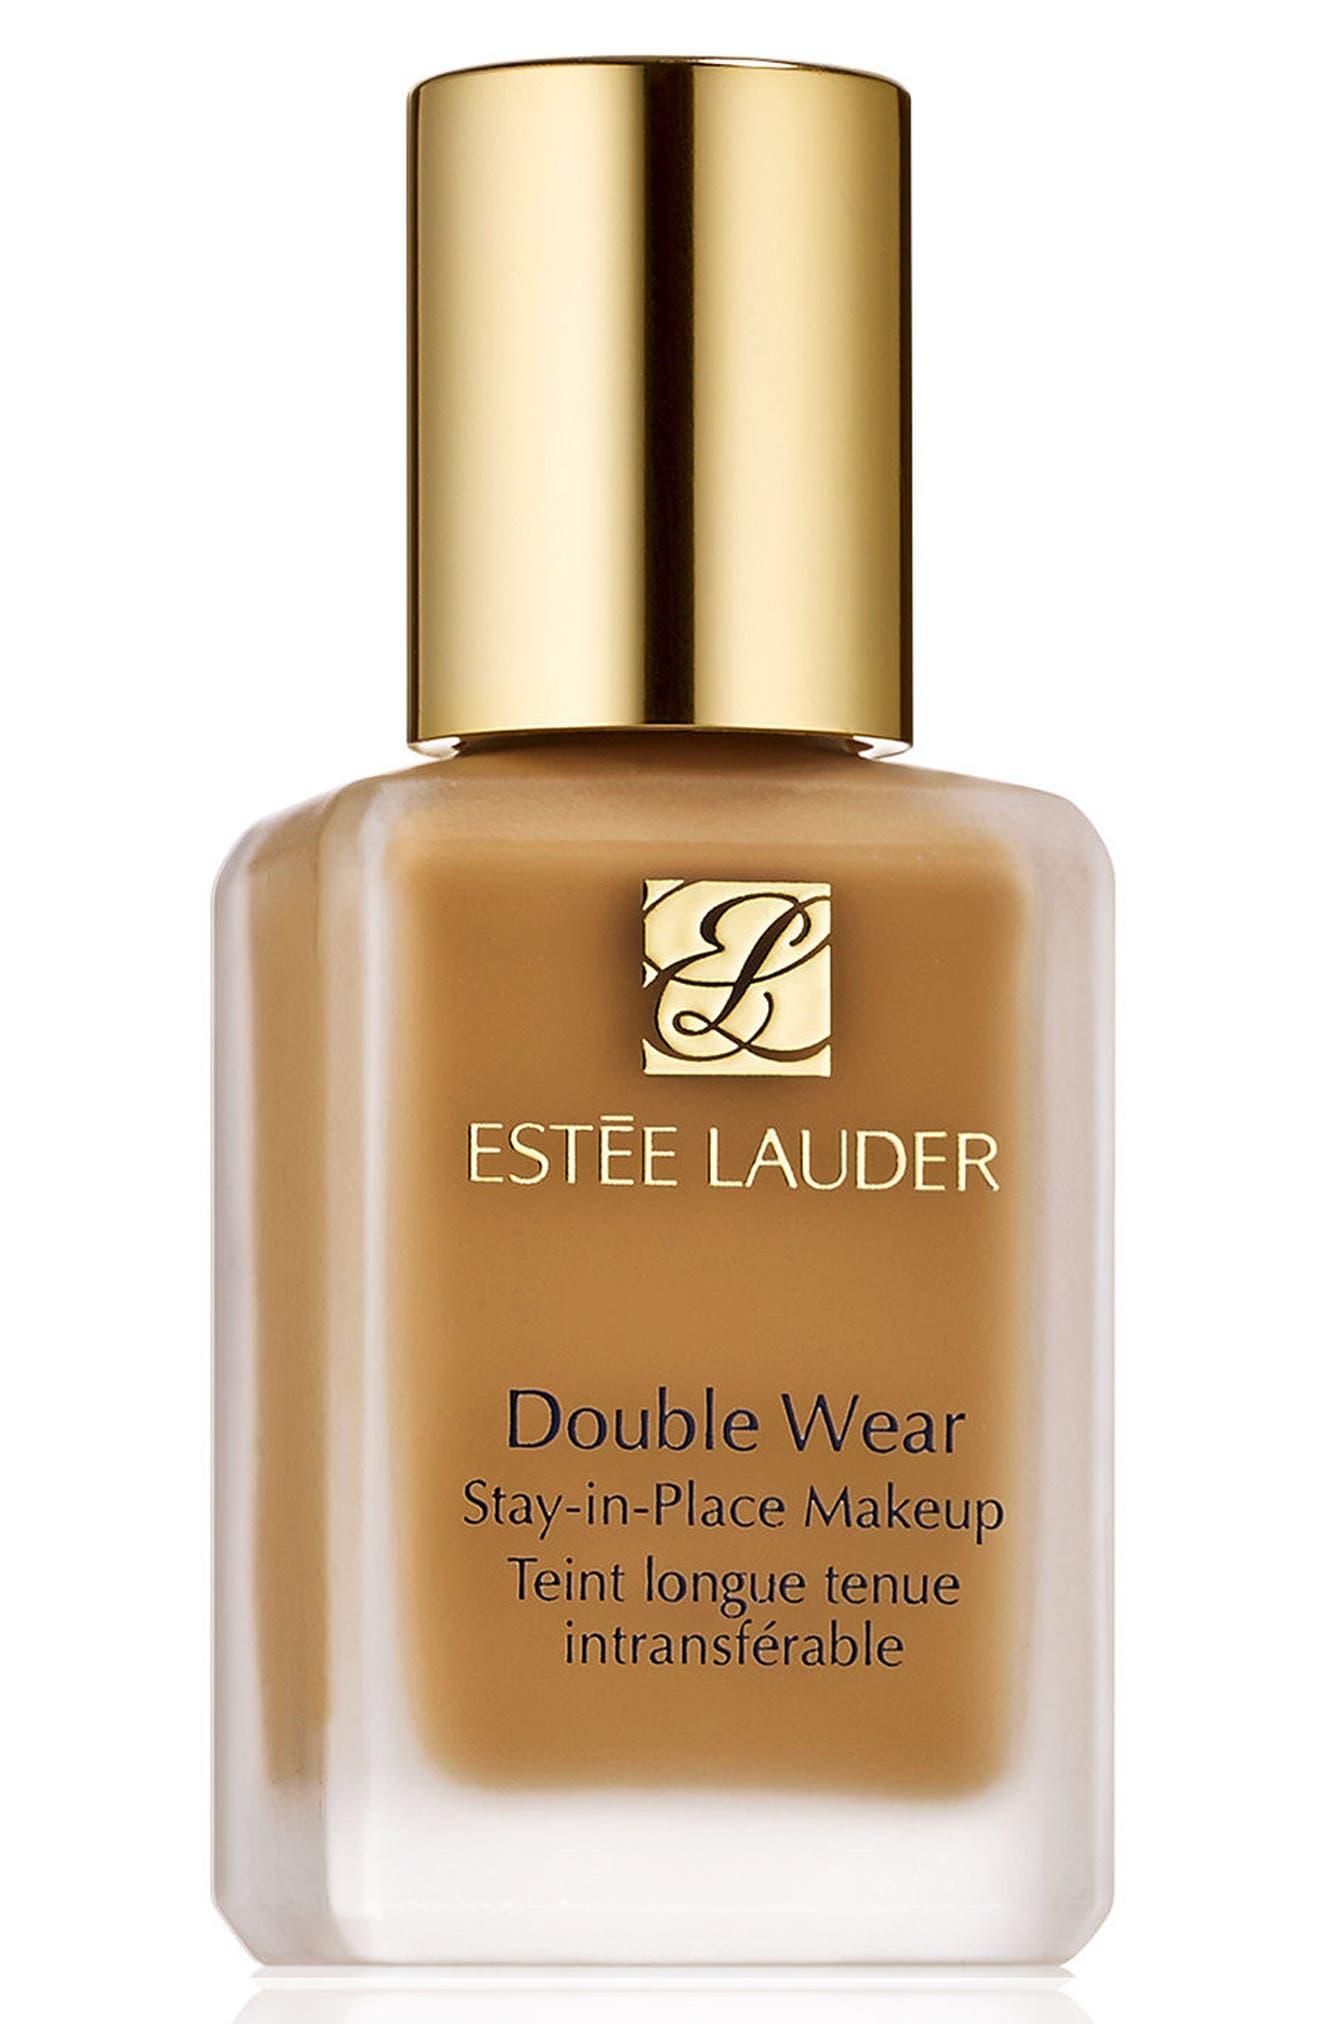 Estee Lauder Double Wear Stay-In-Place Liquid Makeup - 5W1 Bronze